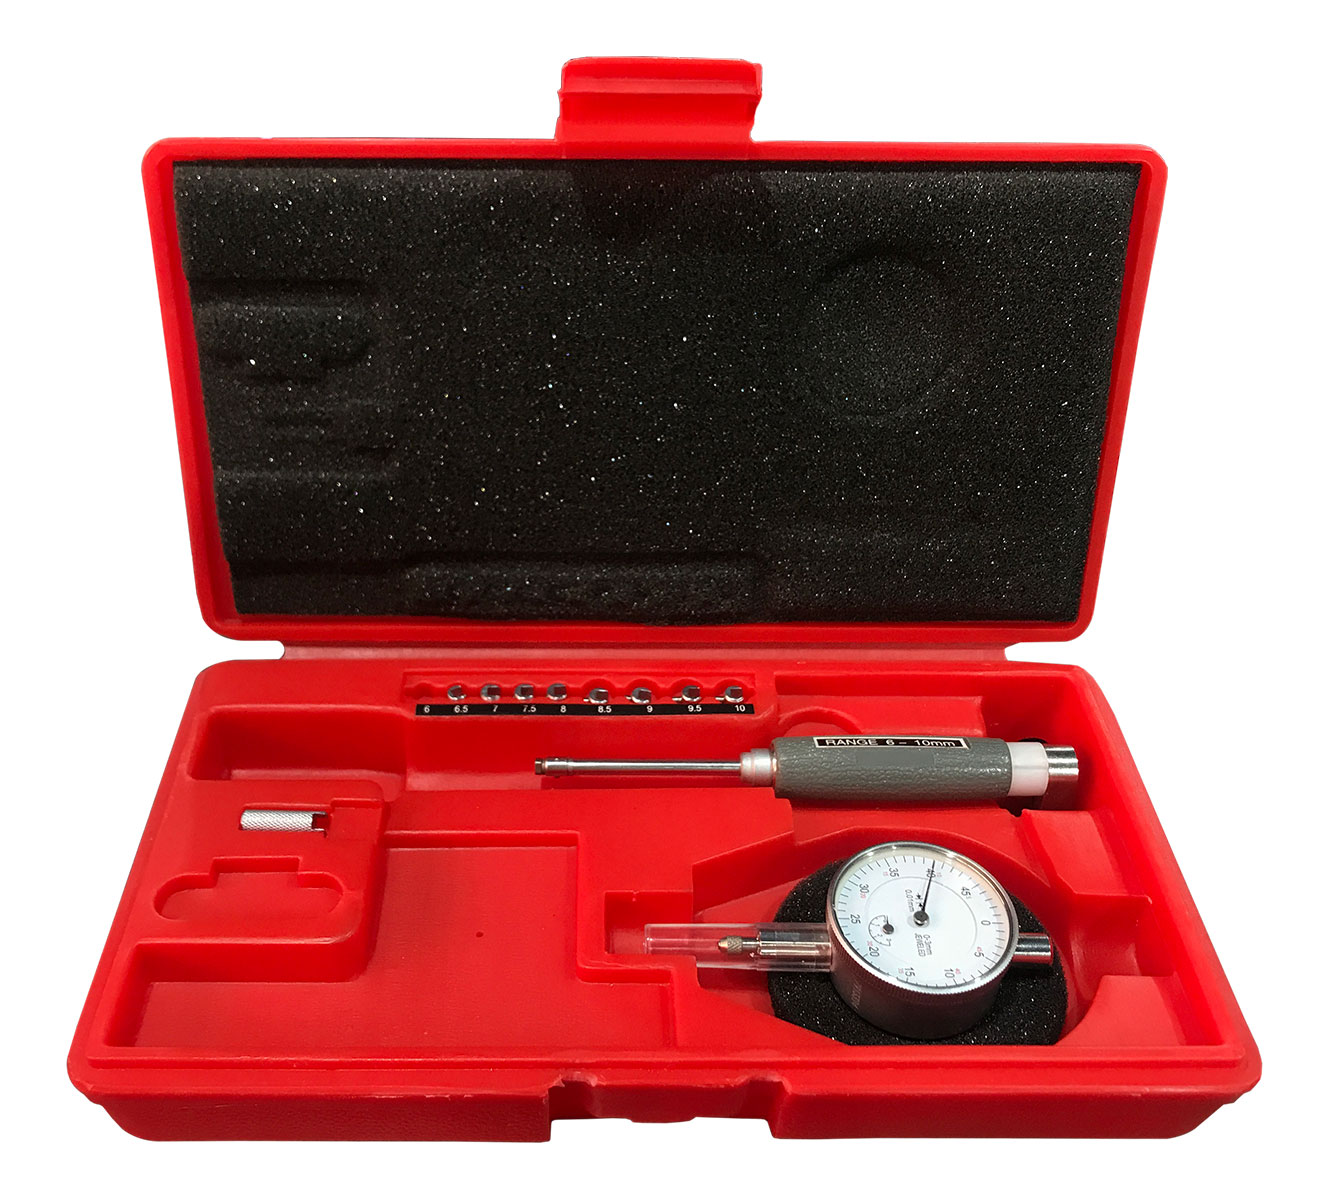 Súbito Comparador De Diâmetro 6-10mm